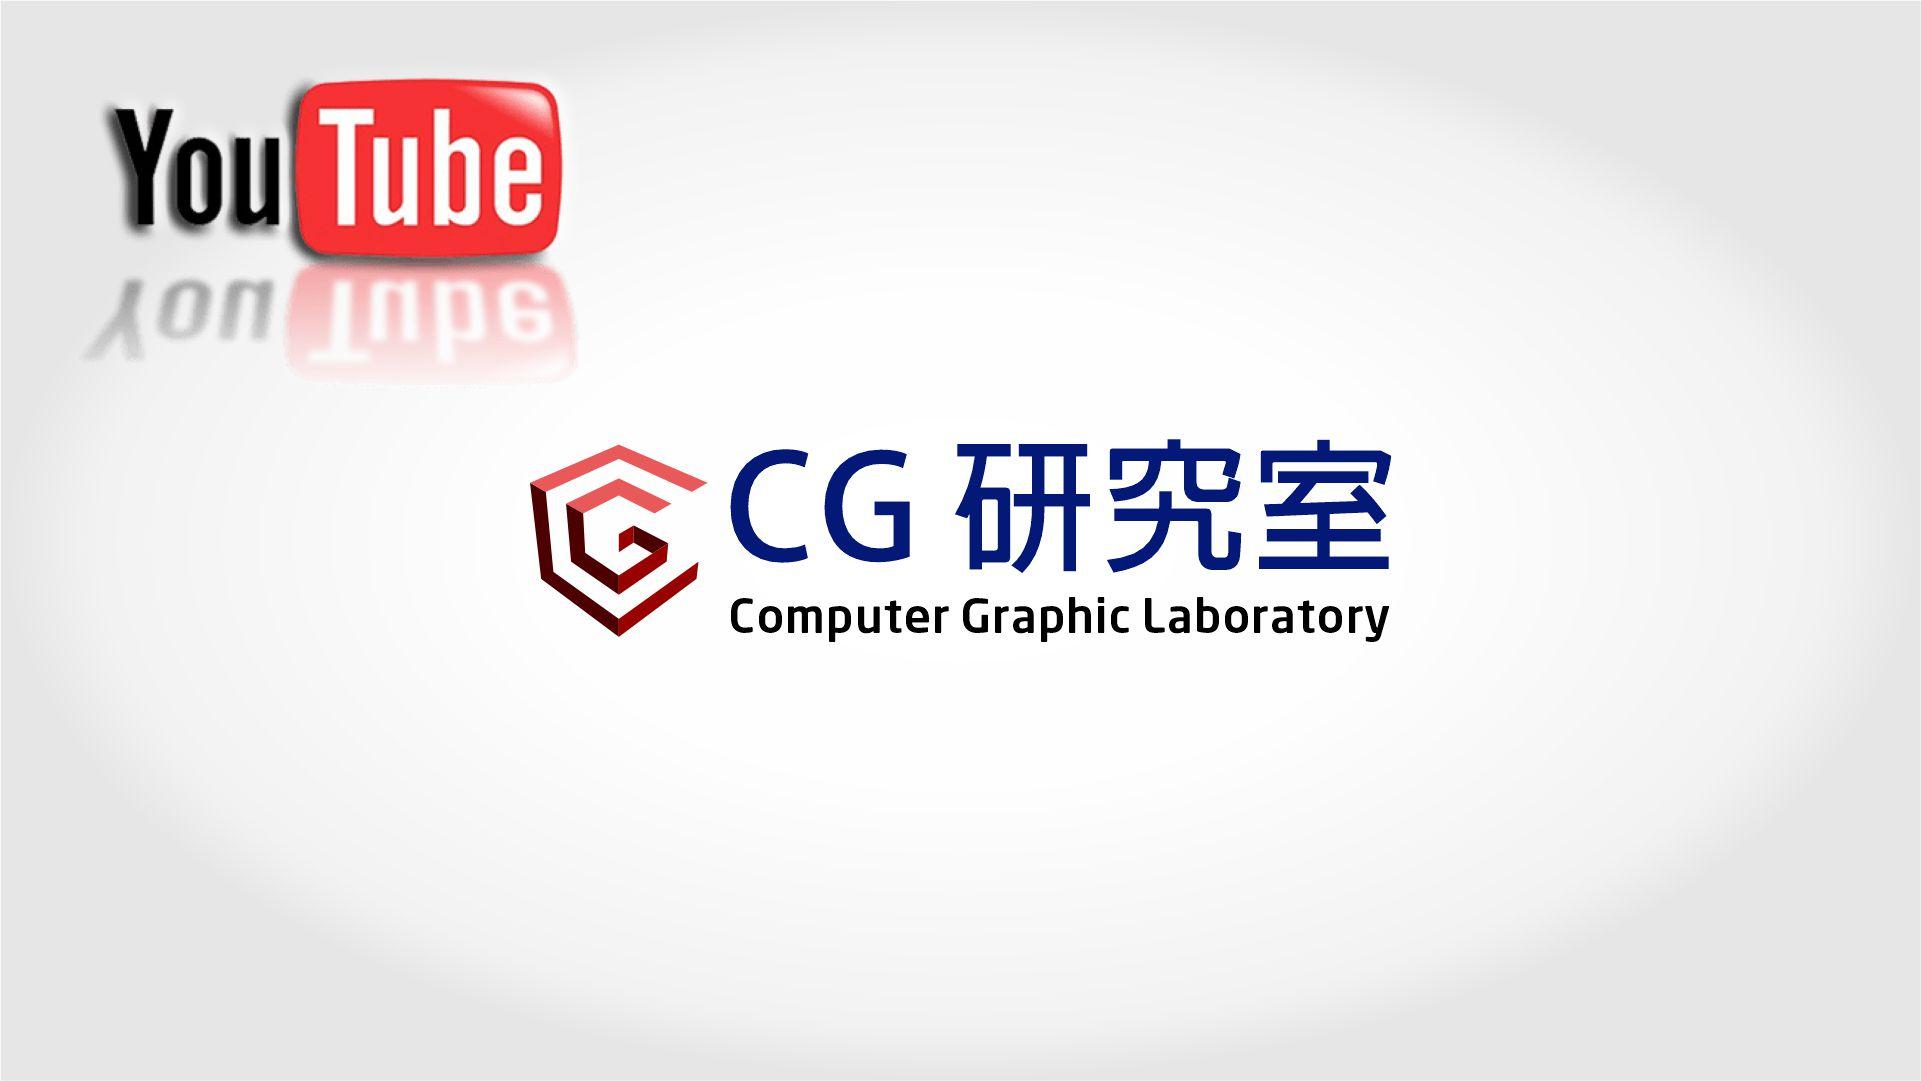 Computer Graphic Laboratory